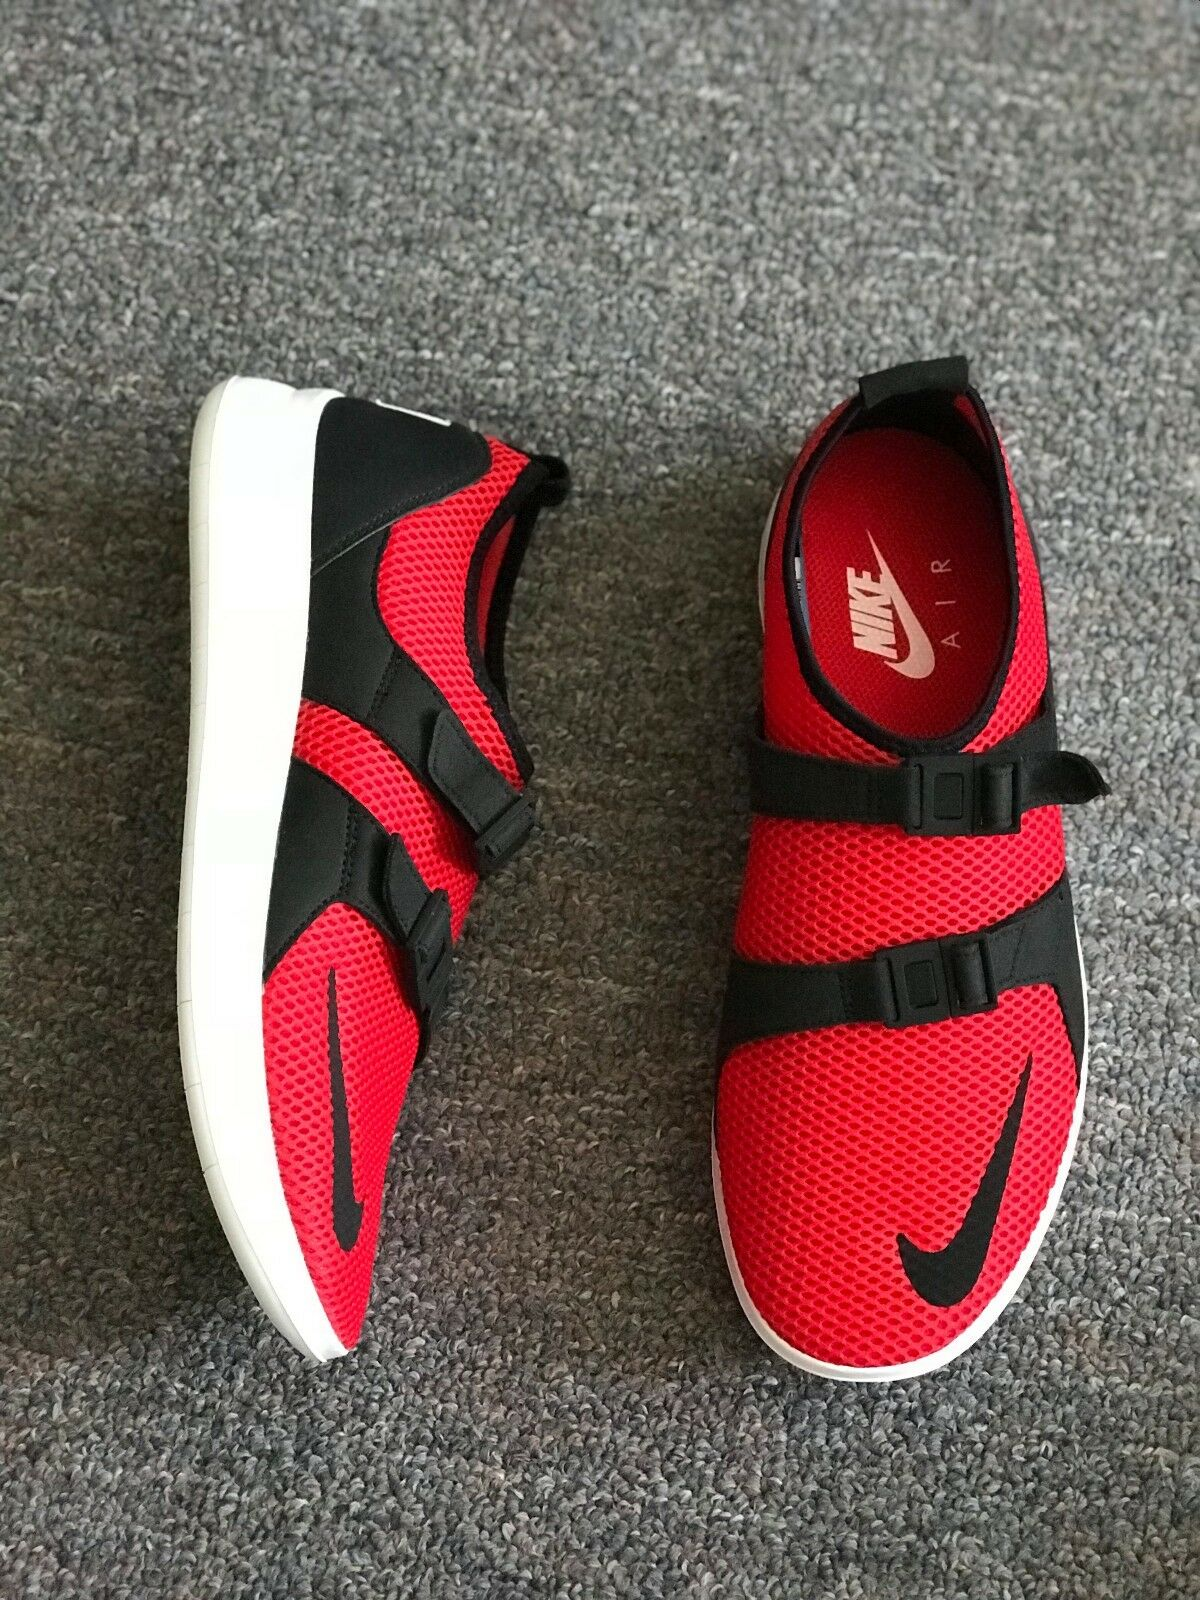 Nike air sock racer sz 9 scarpe campione rosso - nero 918244 600 flyknit dardo